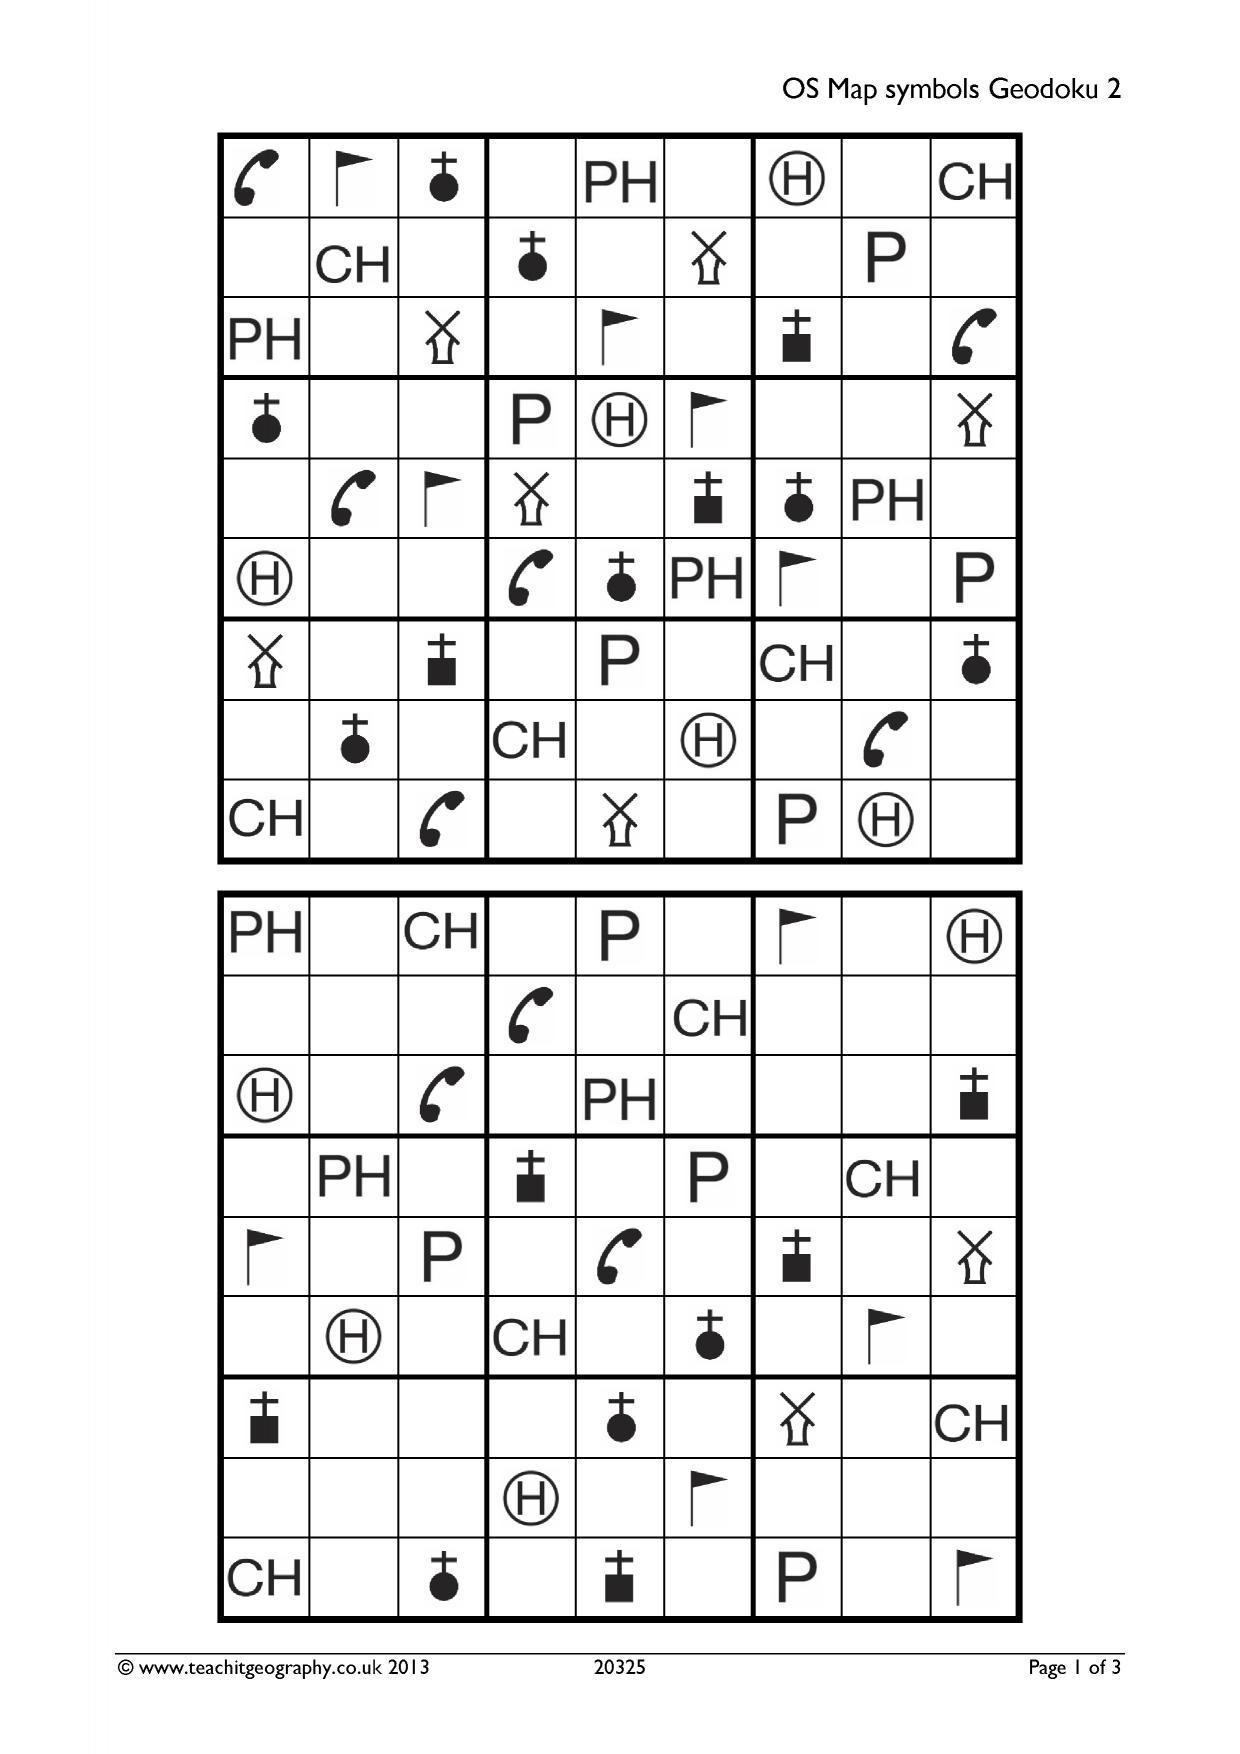 OS map symbols geodoku 2